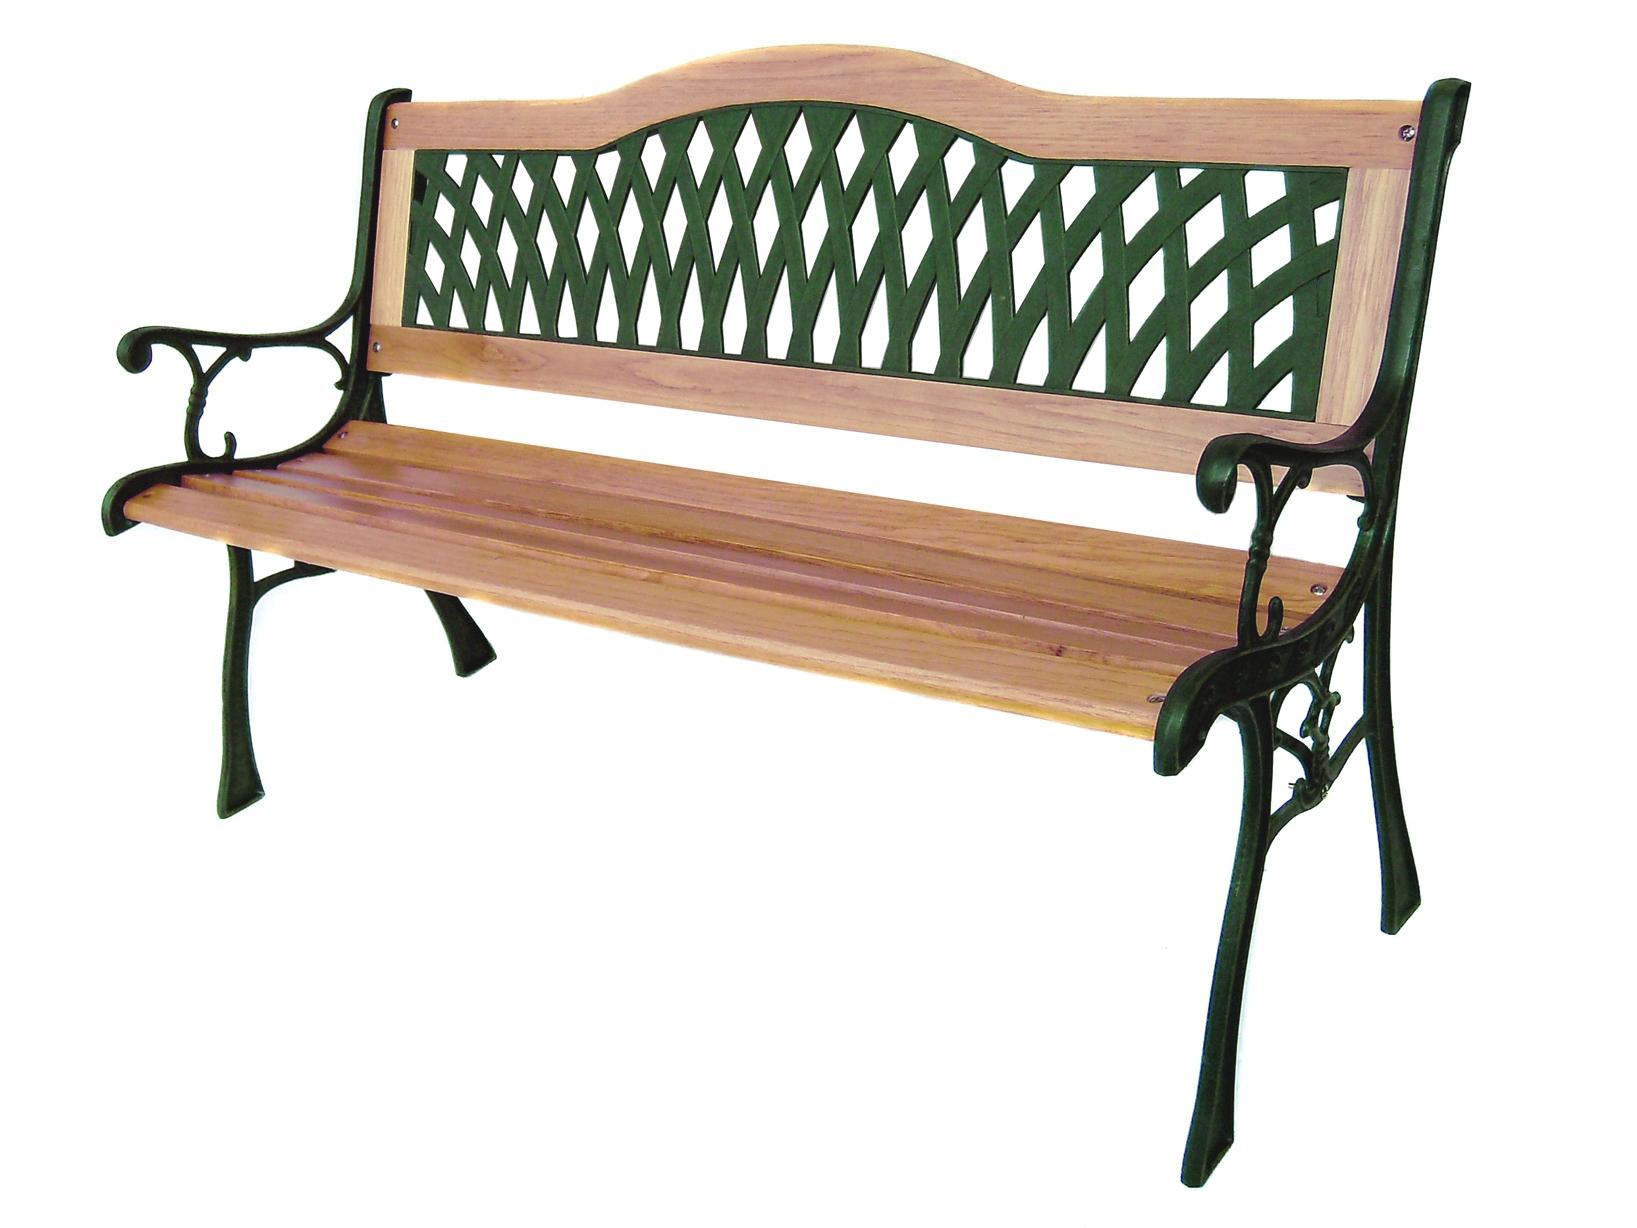 Panchina In Legno Da Giardino.Home Panchina Legno Ghisa Verde 126x53x75 Giardino Arredo Da Esterno